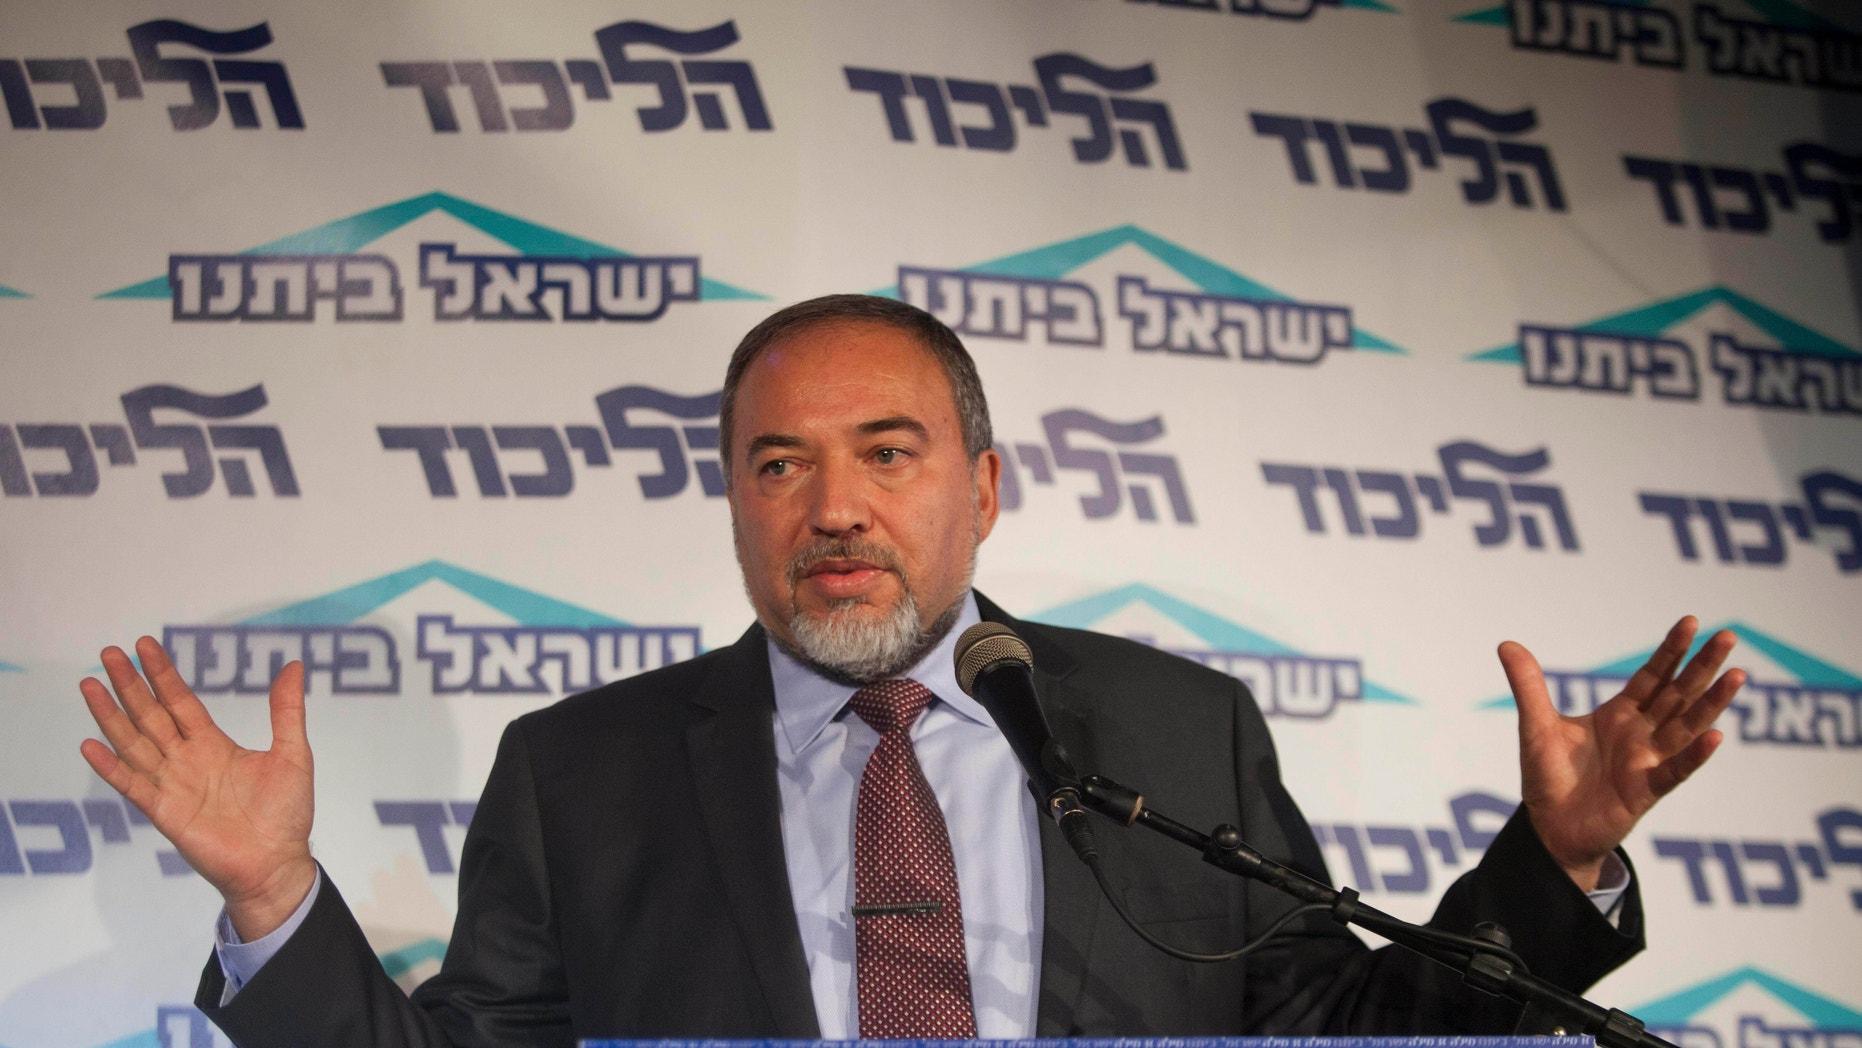 Dec. 13, 2012 -Israel's Foreign Minister Avigdor Lieberman speaks to the media during an event in Tel Aviv, Israel.